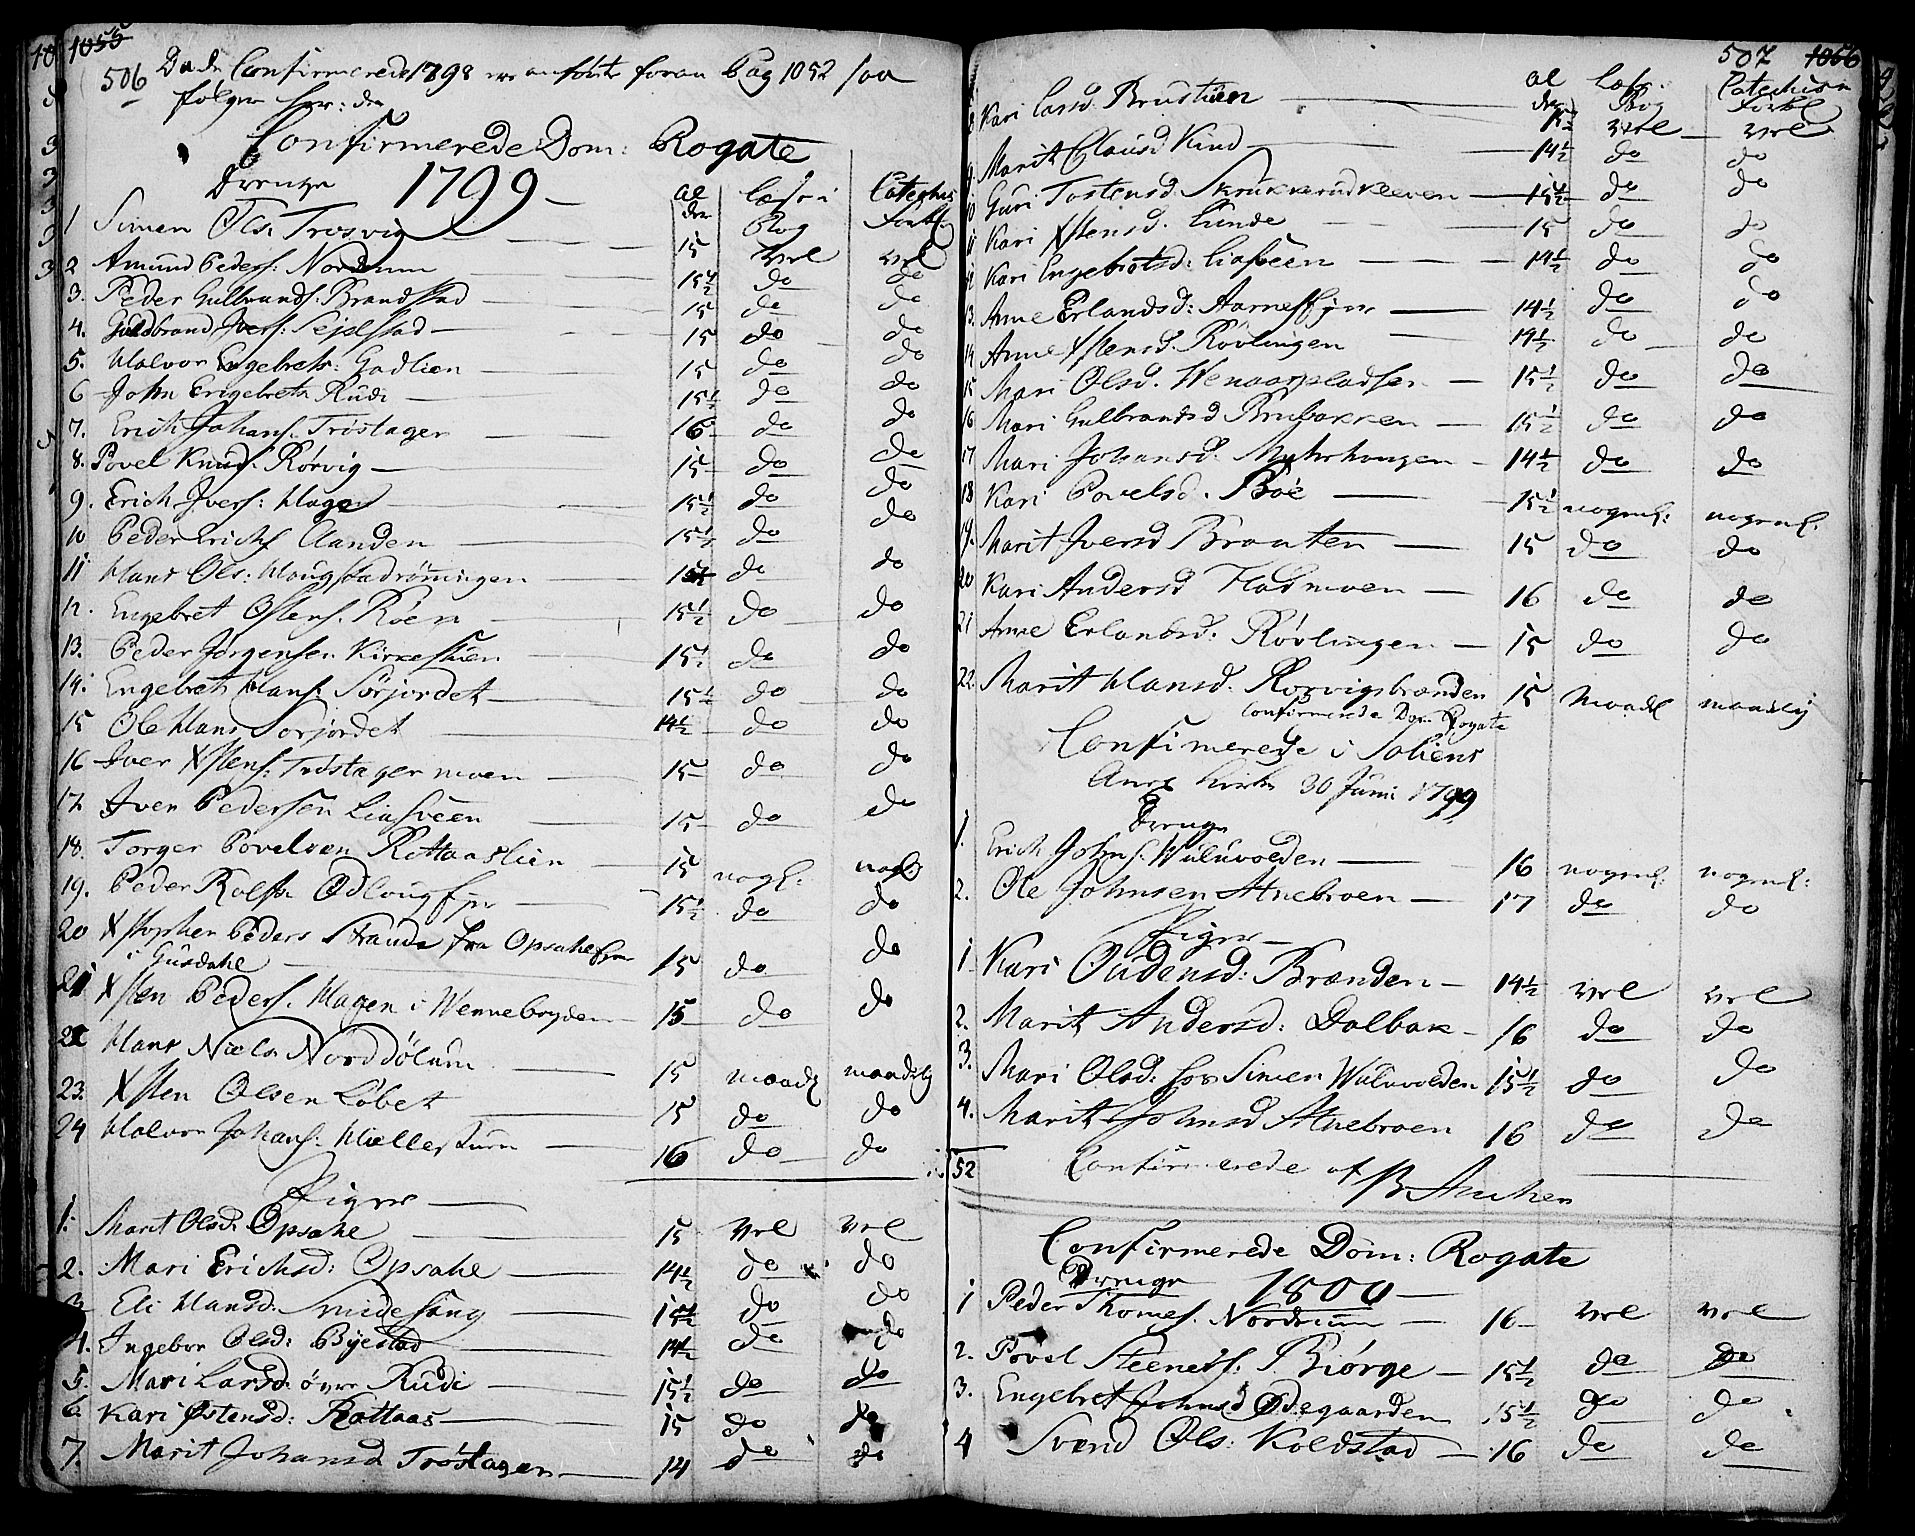 SAH, Ringebu prestekontor, Ministerialbok nr. 3, 1781-1820, s. 506-507